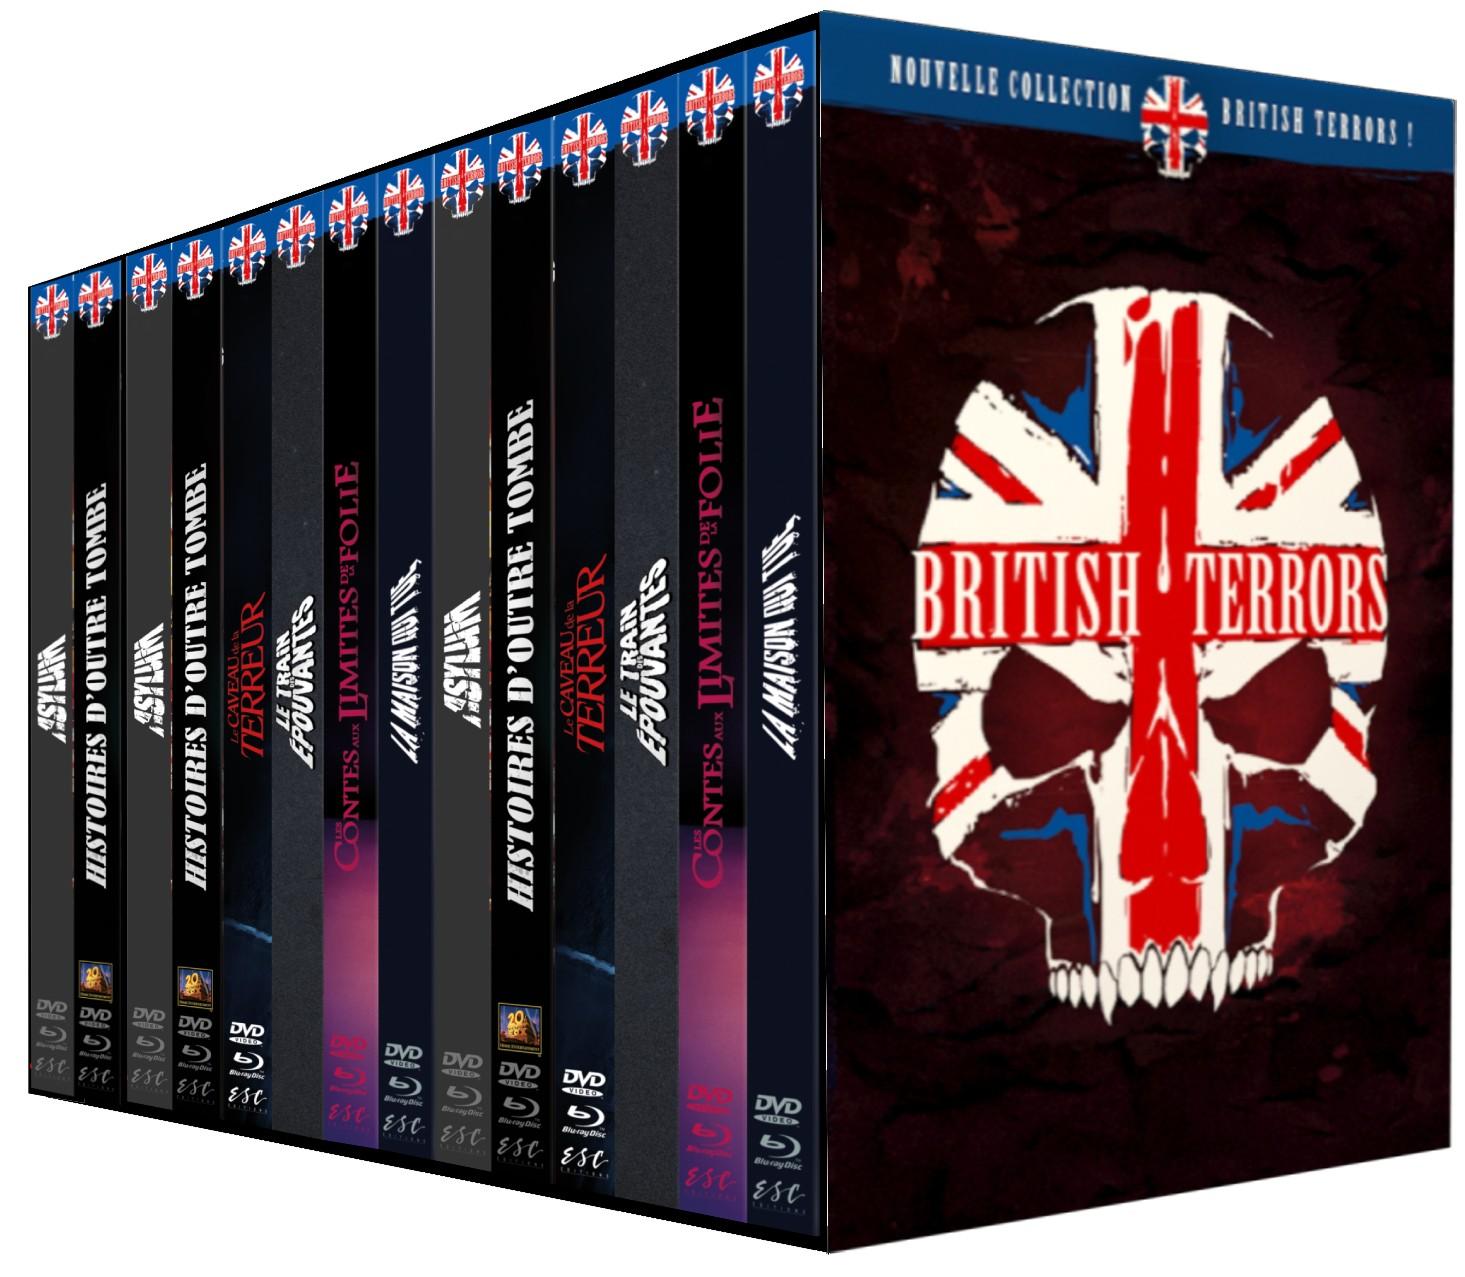 PACK ULTRA COLLECTOR BRITISH TERRORS - 8 MEDIABOOKS HAMMER